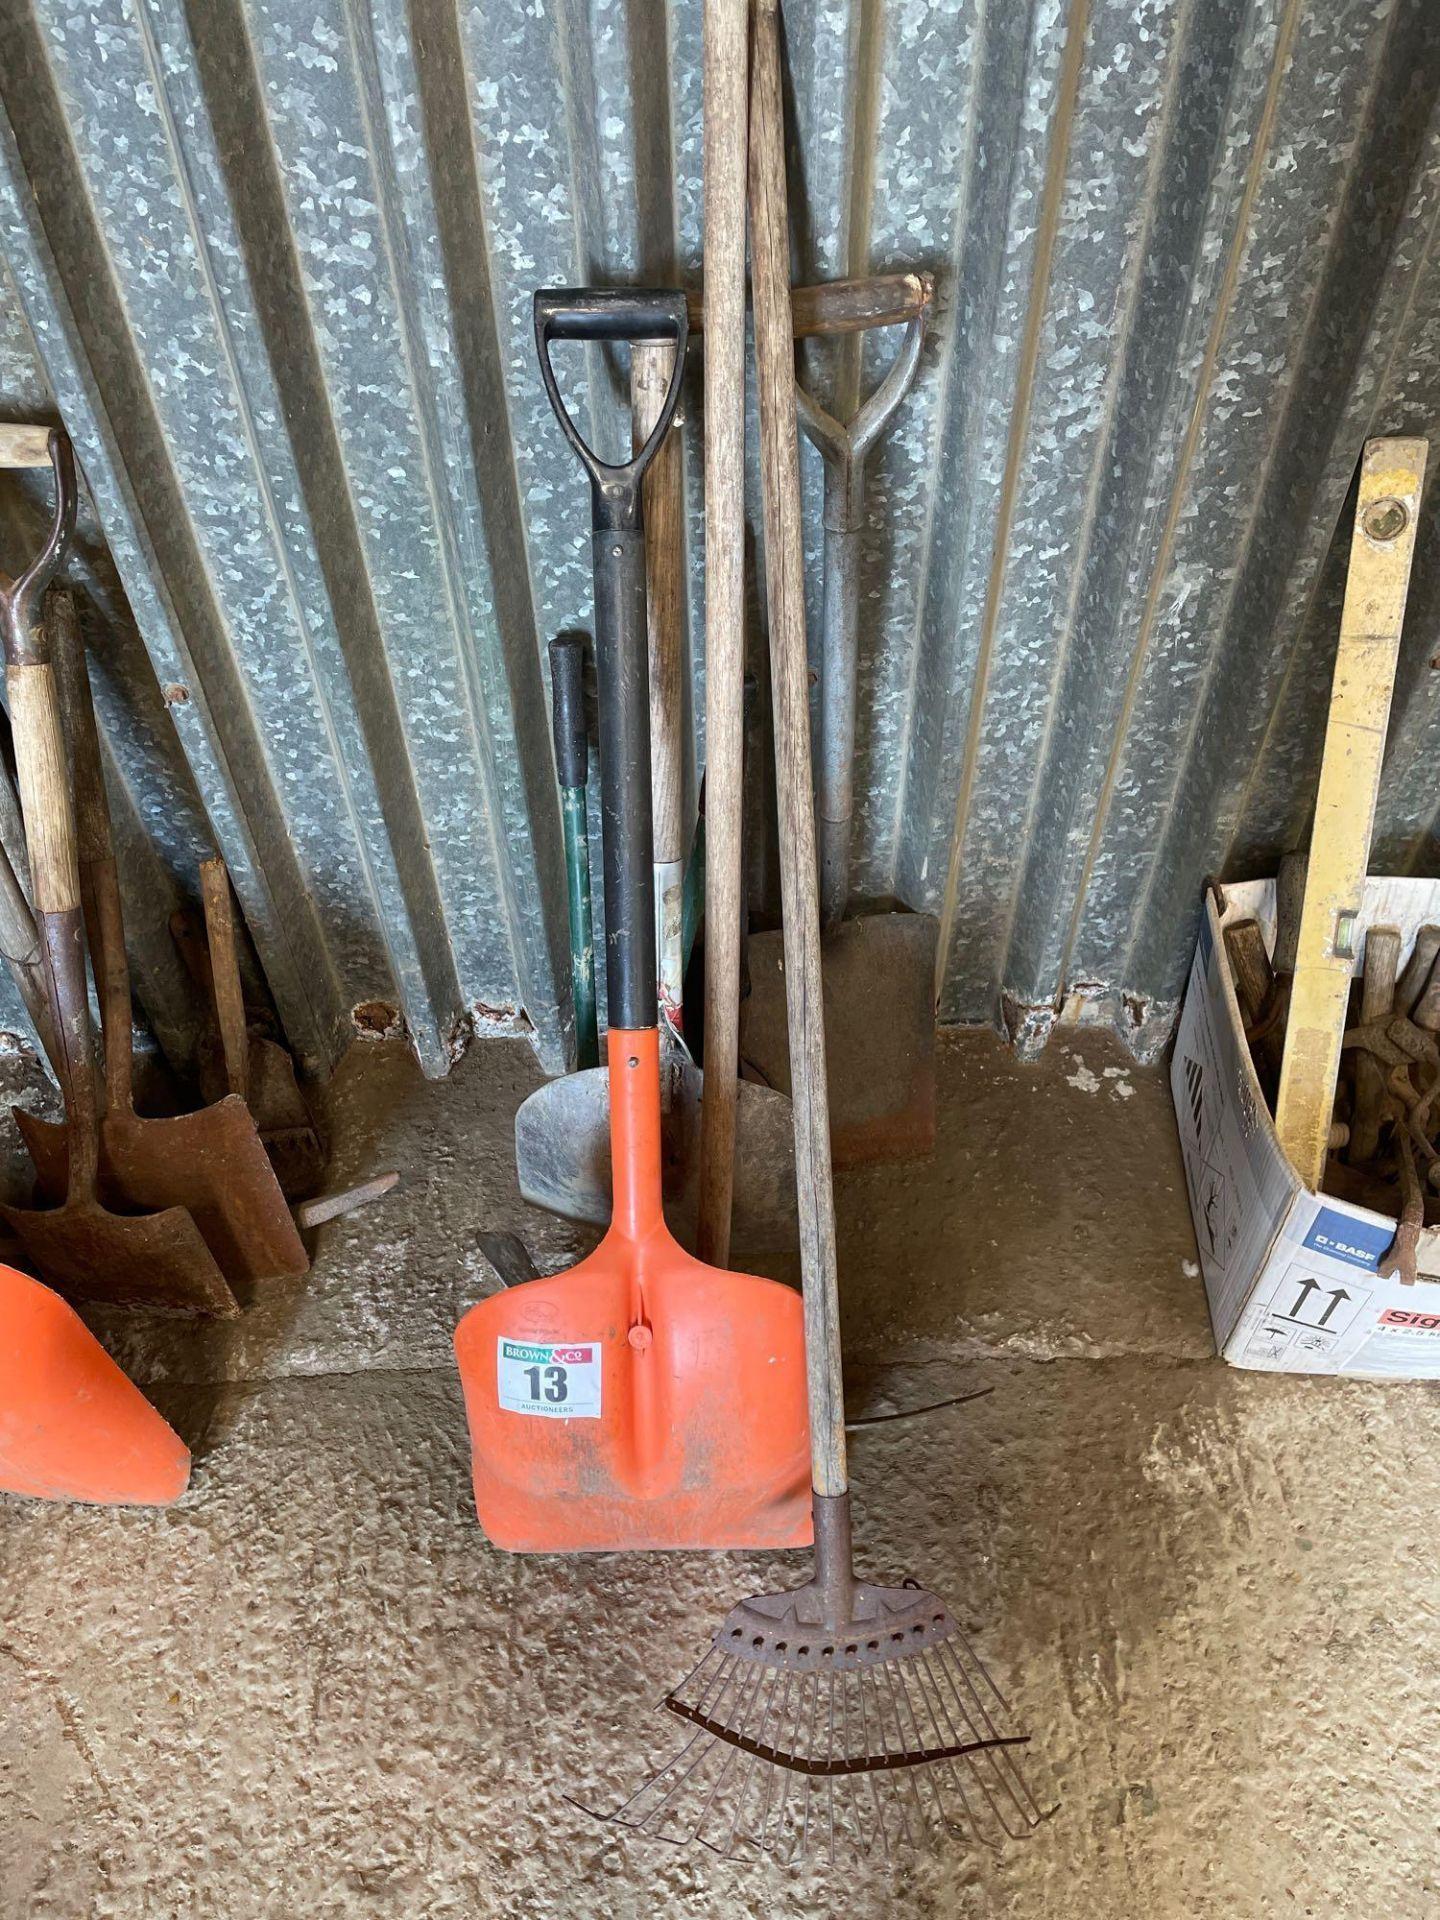 Quantity hand tools - Image 2 of 2